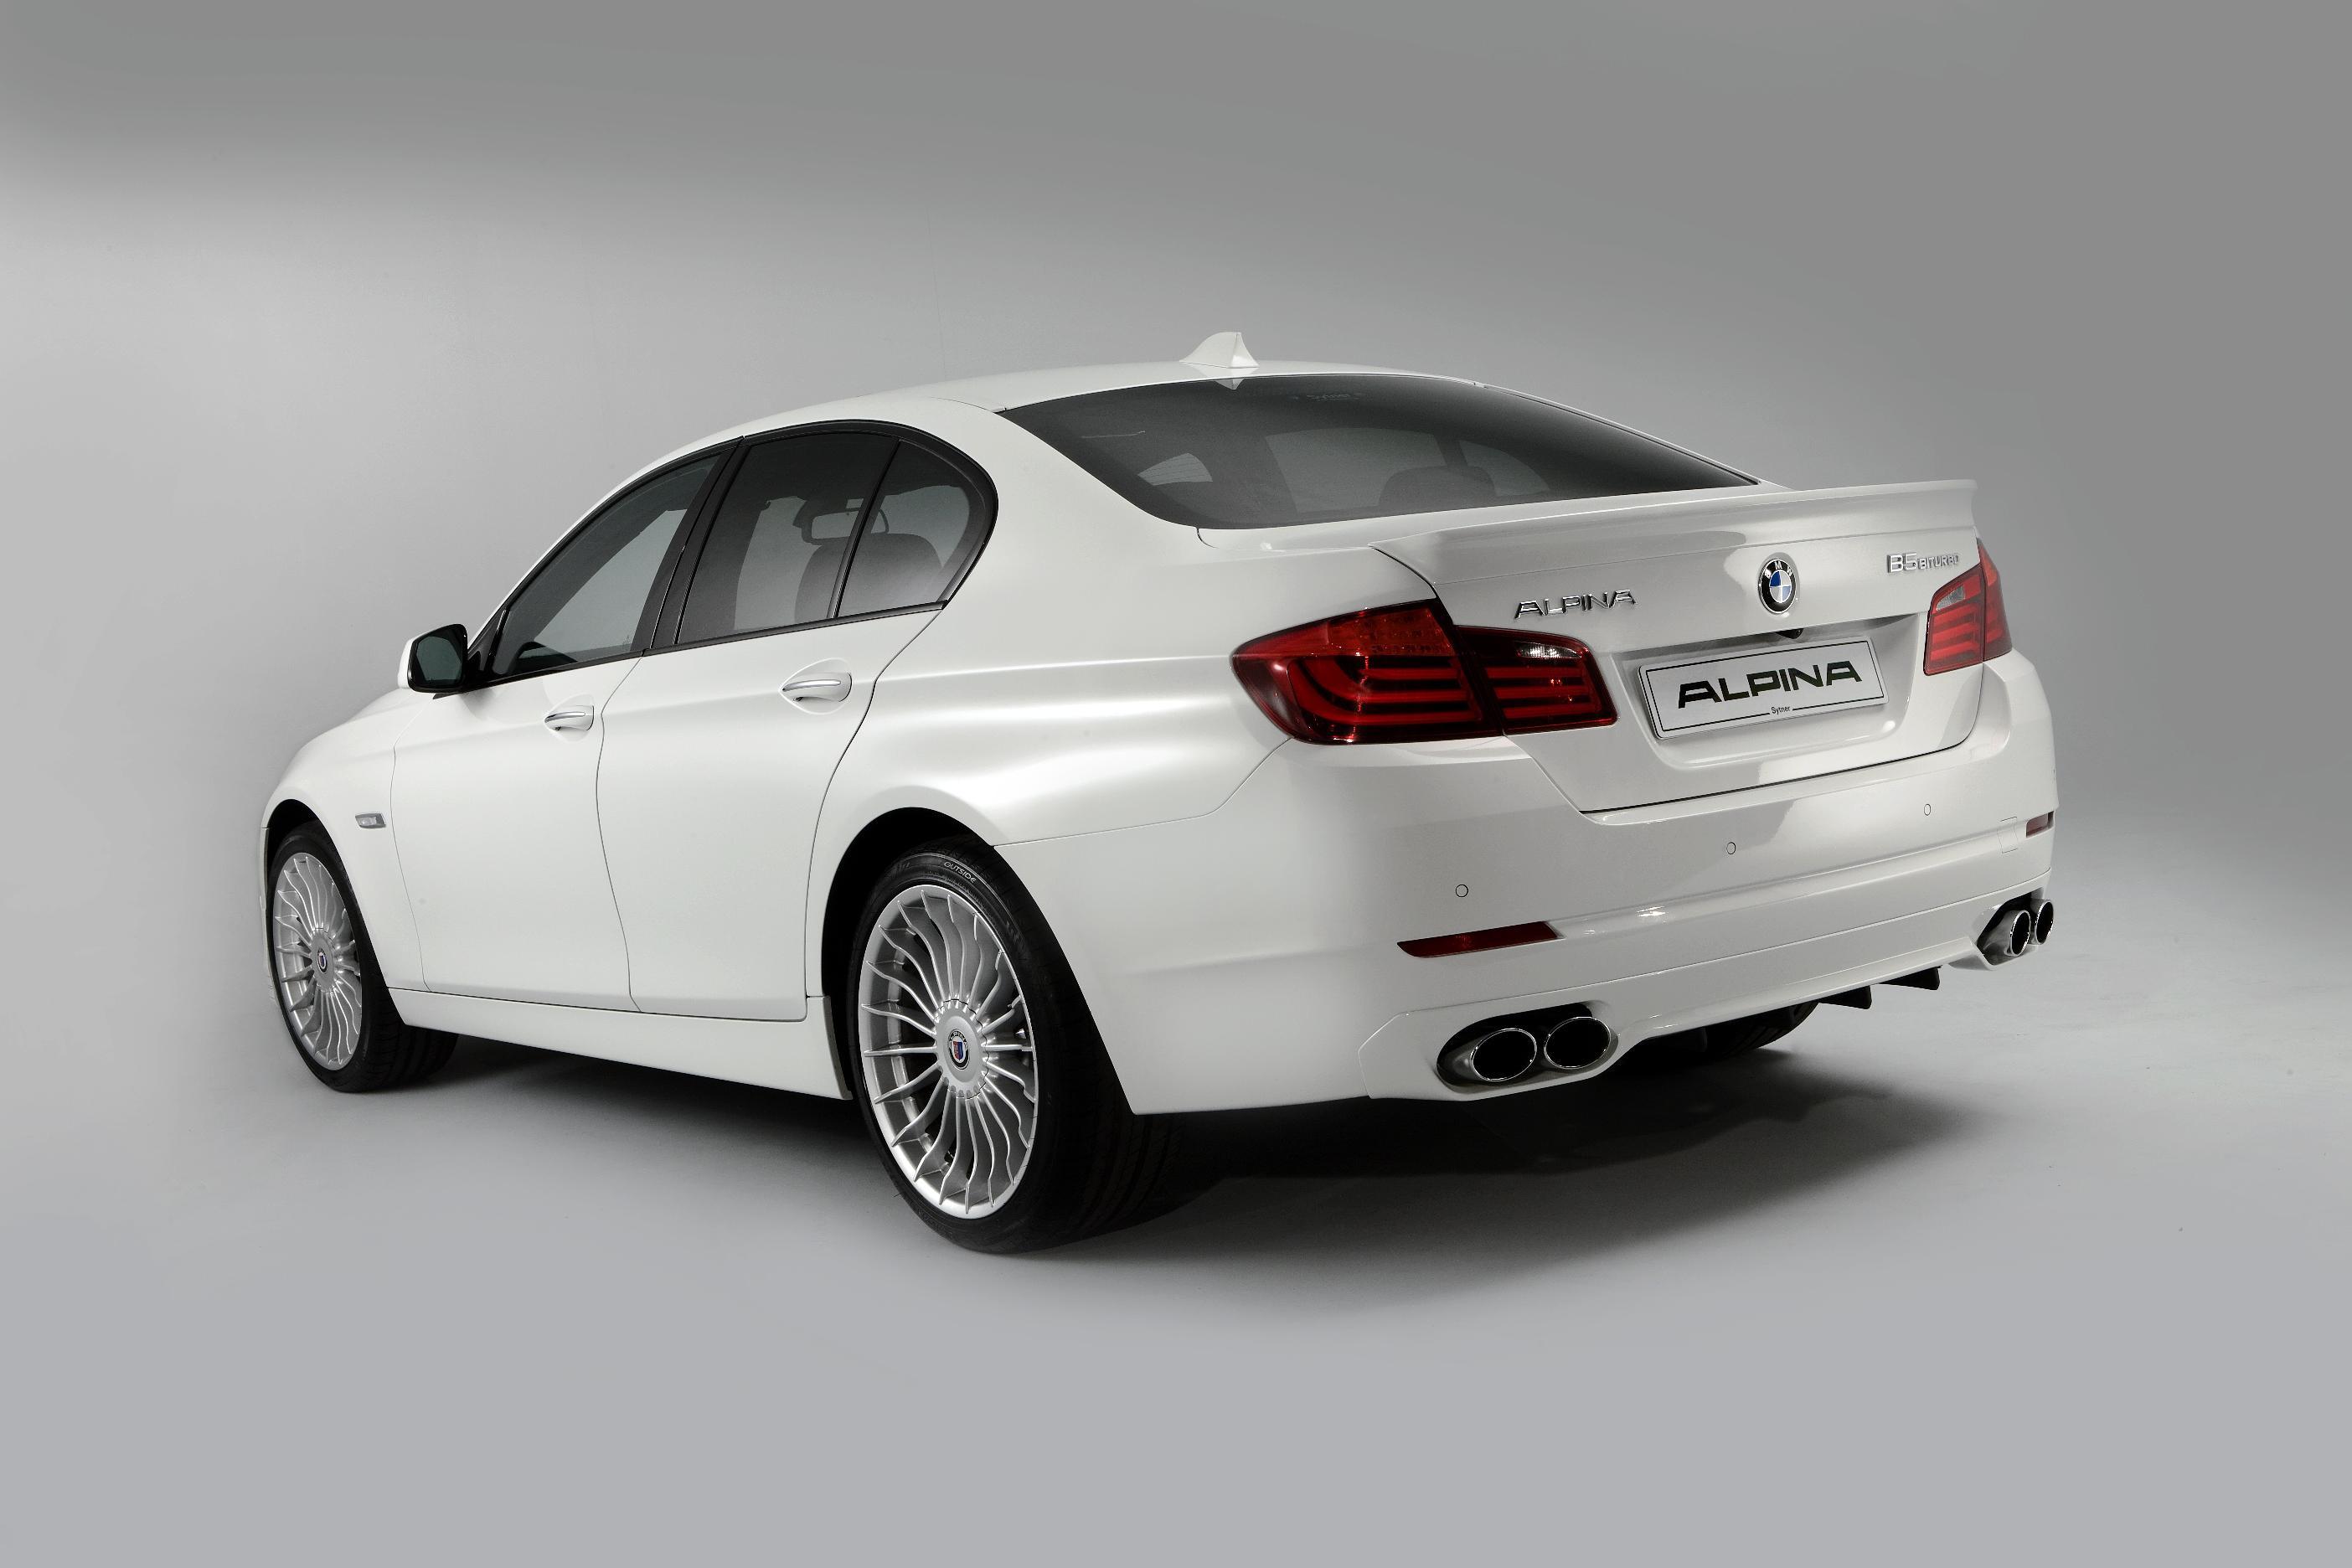 BMW ALPINA B BiTurbo Arrives In UK Motor Trade News - Bmw b5 alpina for sale